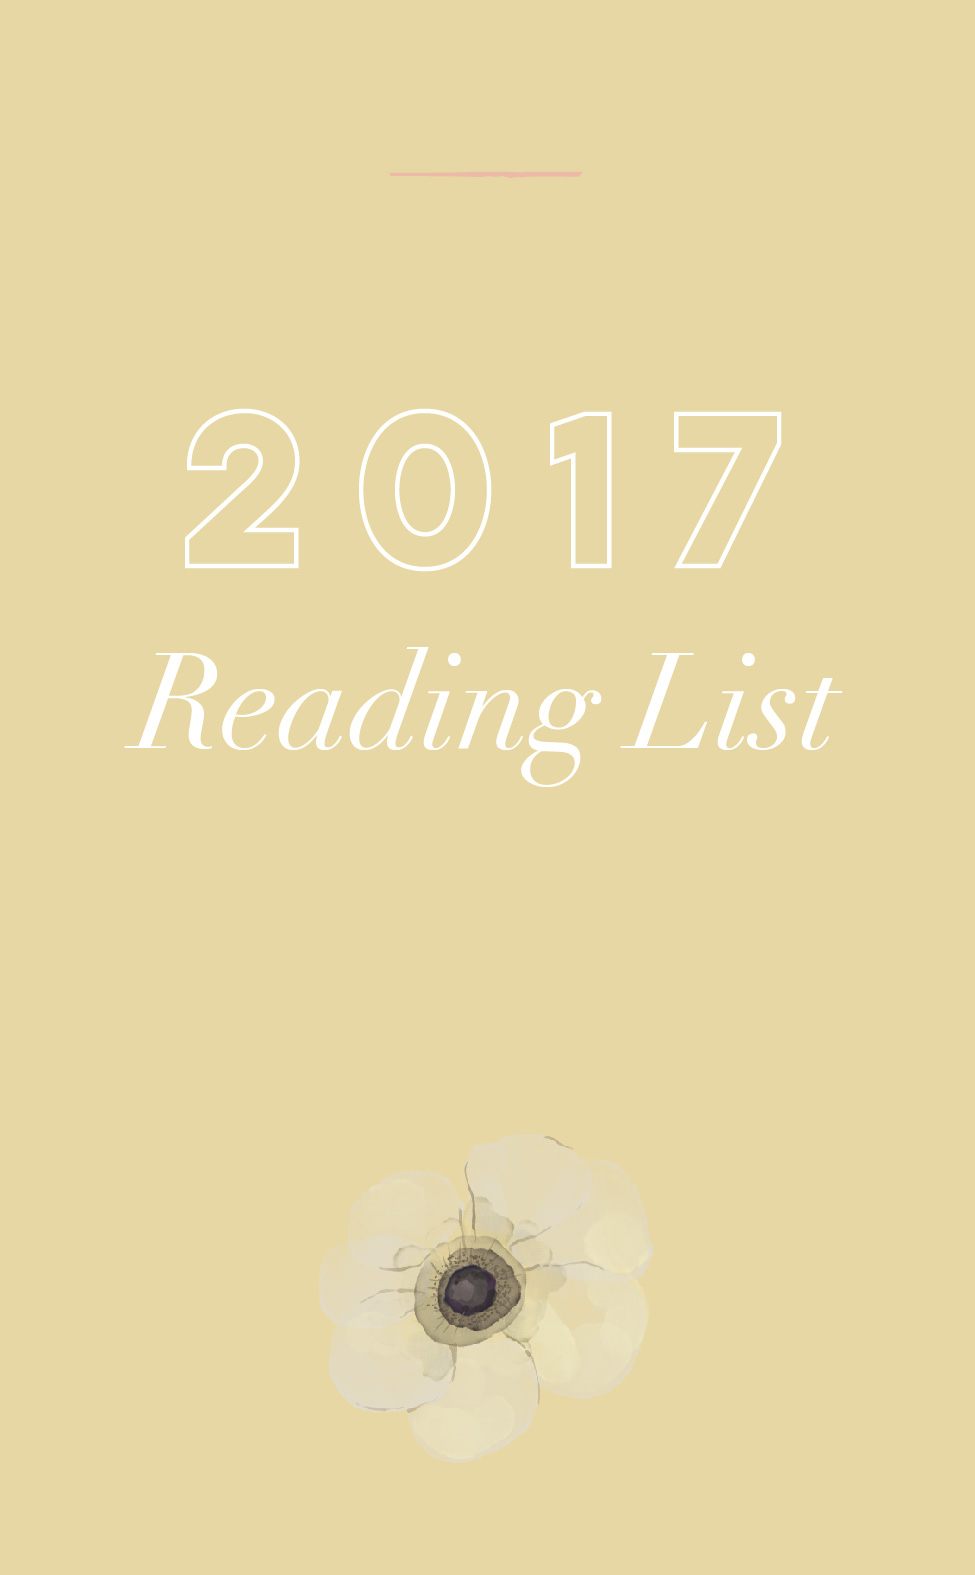 readinglist.jpg